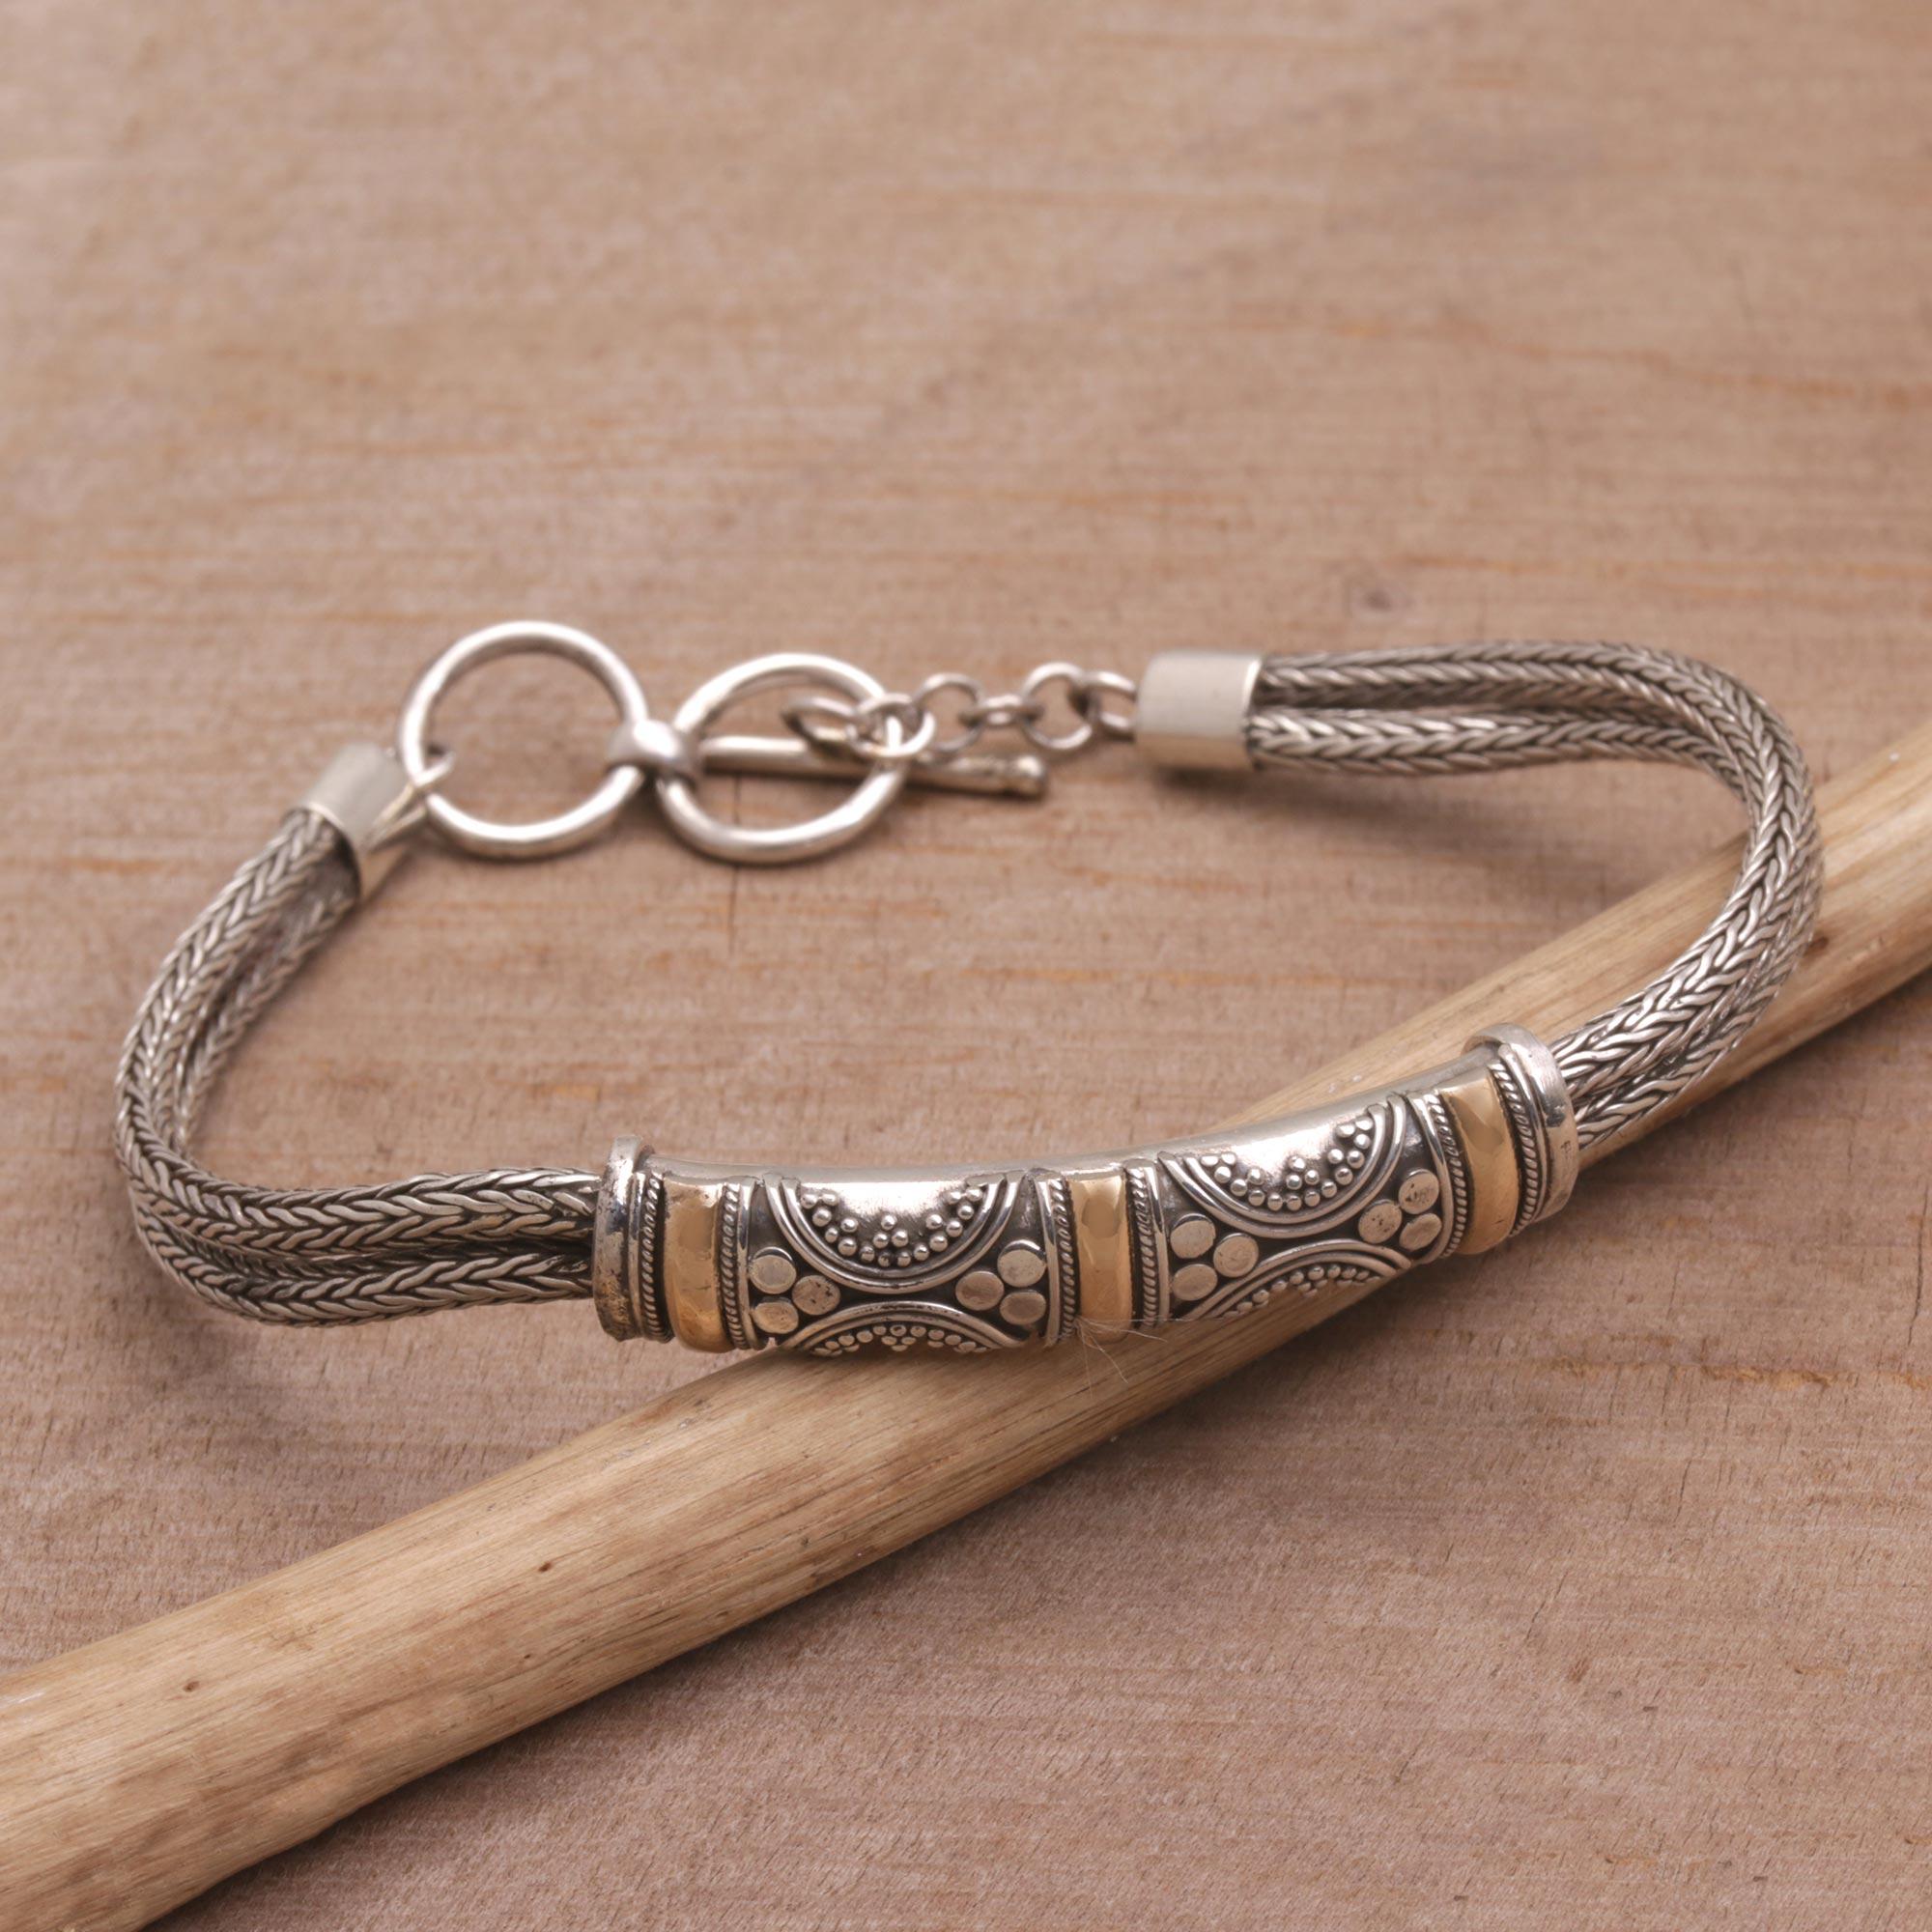 SILVER BRACELETS Sterling Silver Bracelet Gallery at NOVICA